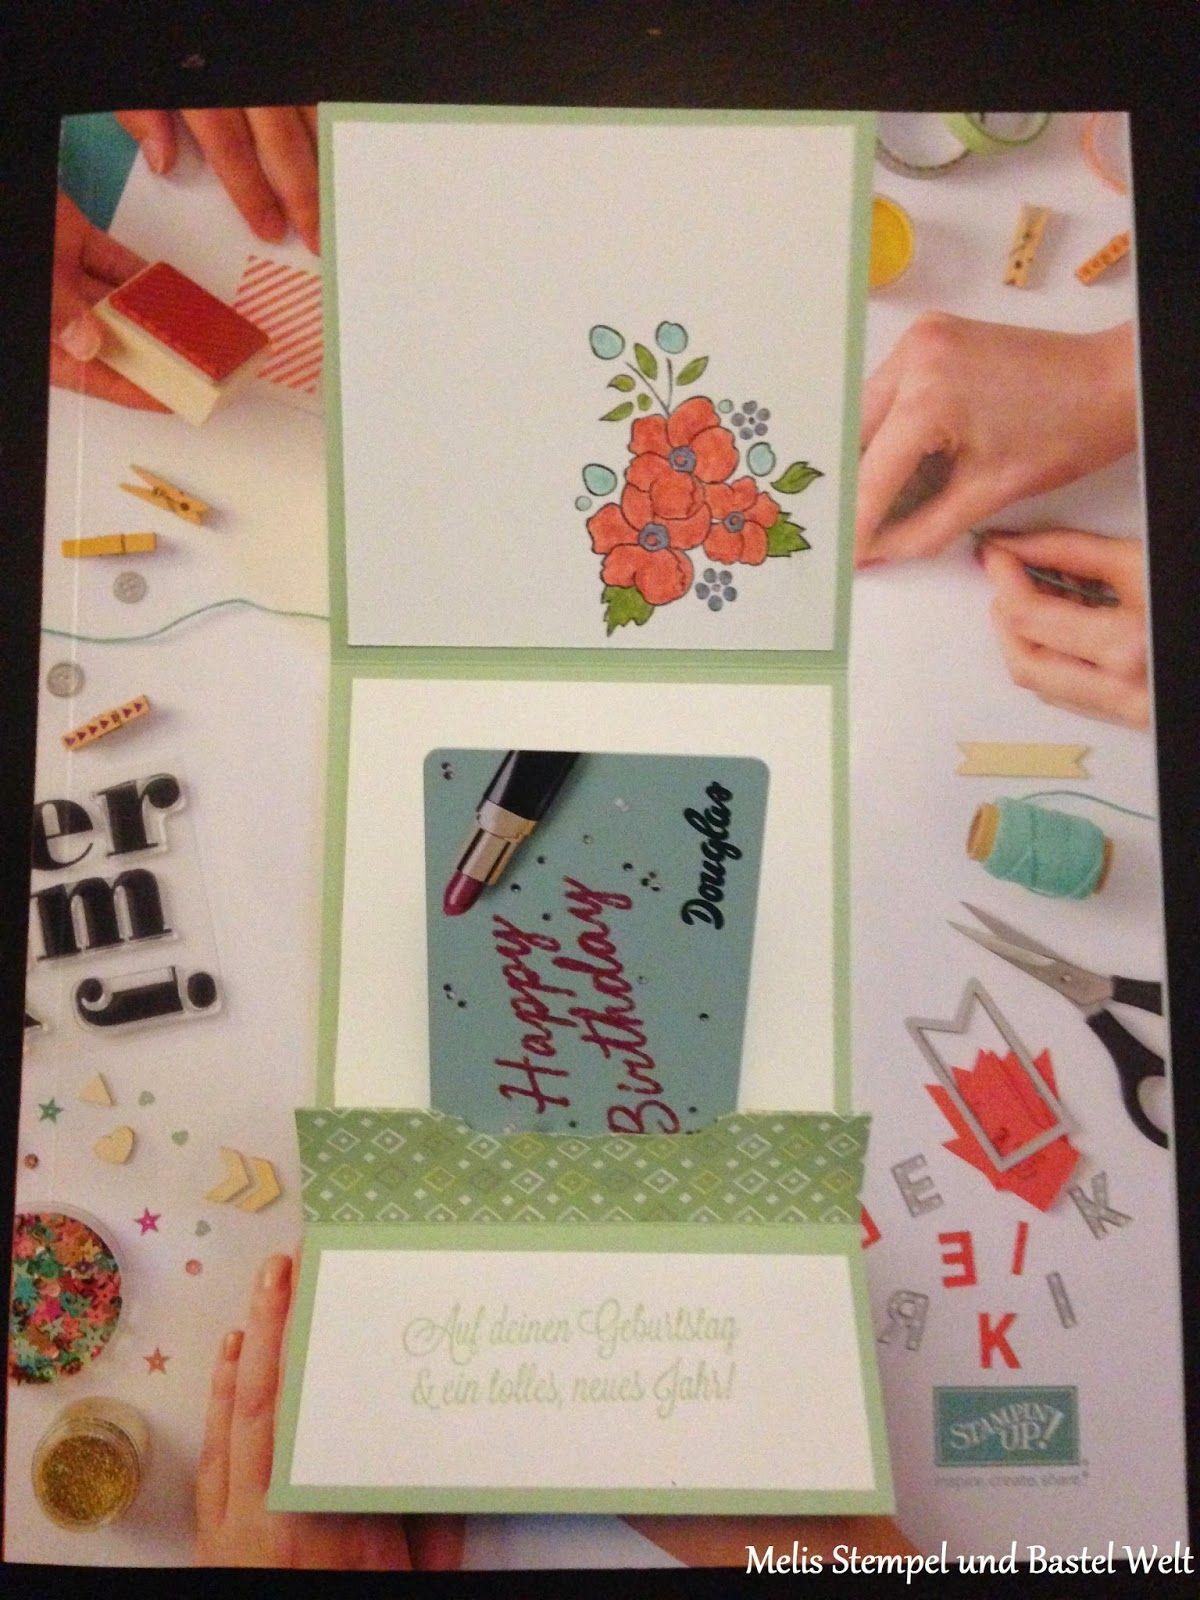 Stampin Up Verpackung, Gutschein Karte, SAB 2014, Sale a Bration, Süße Sorbets, Dein Tag, Bordering On Romance, Stampin Write Marker